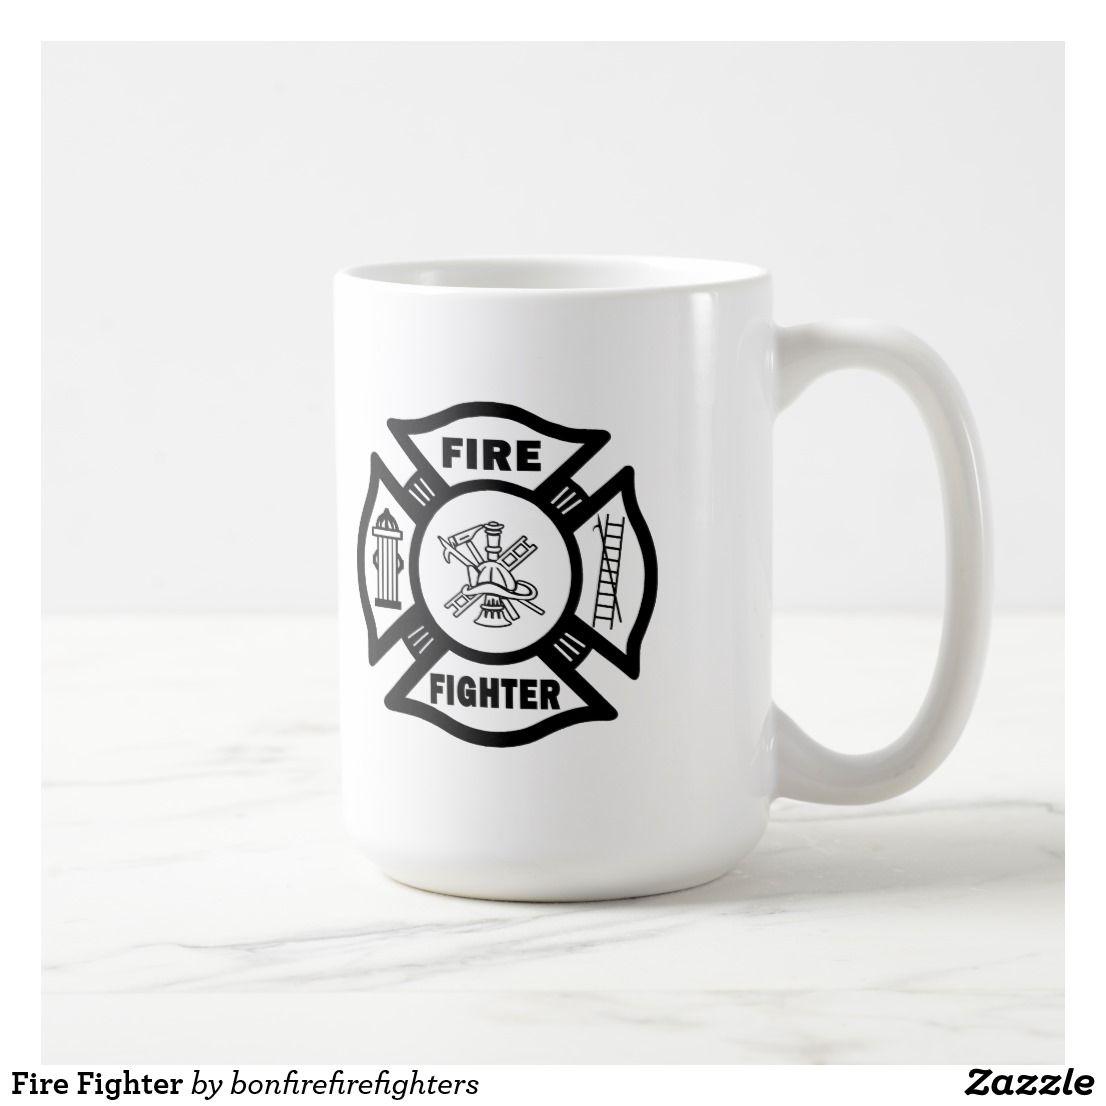 Fire fighter coffee mug mugs firefighter